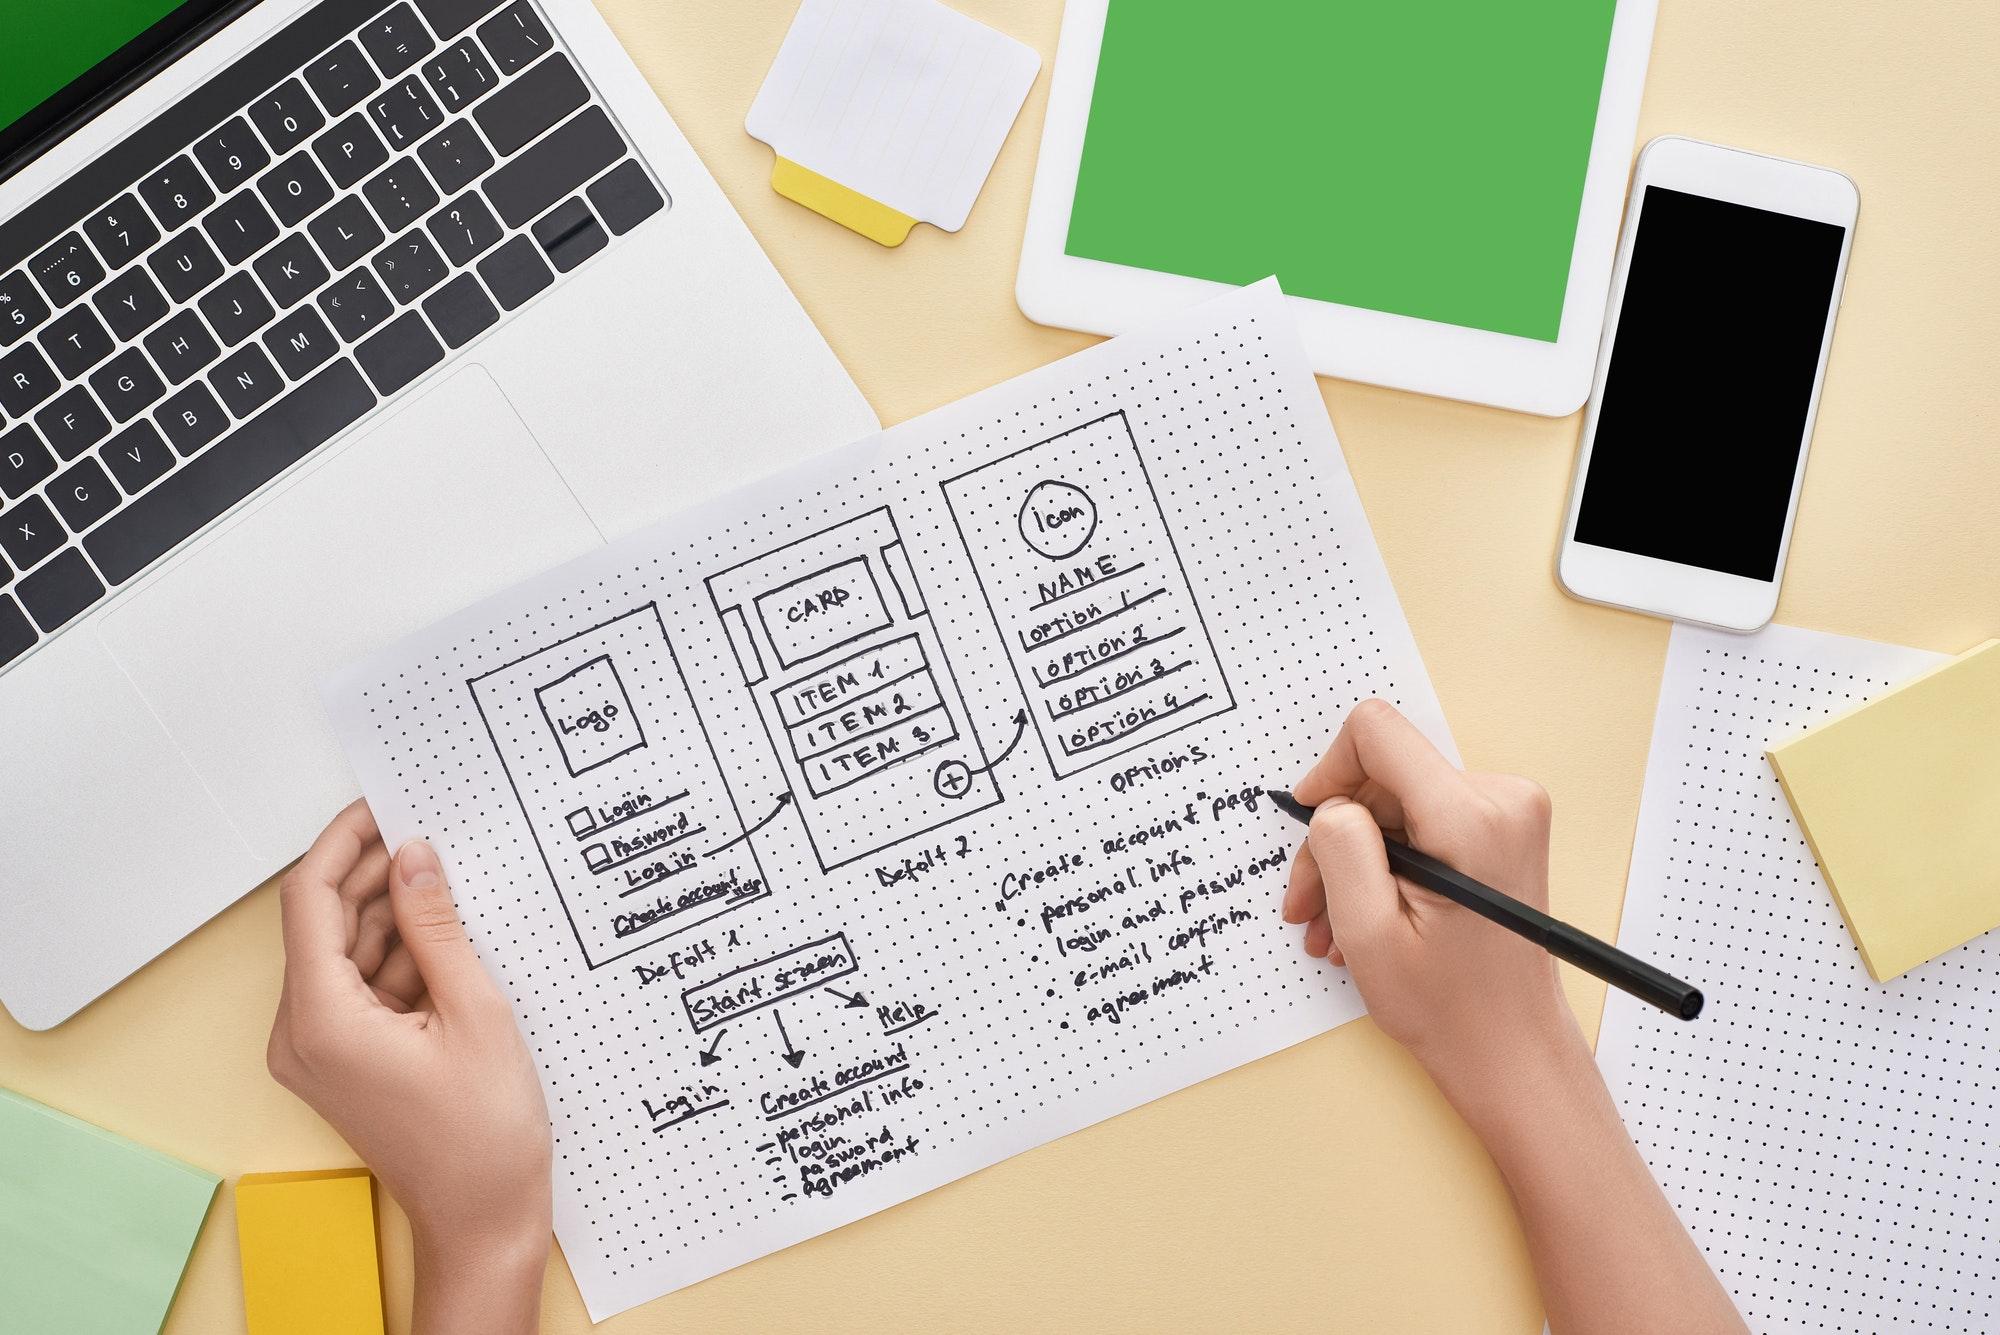 Website feedback tools: view of a website designer's templates